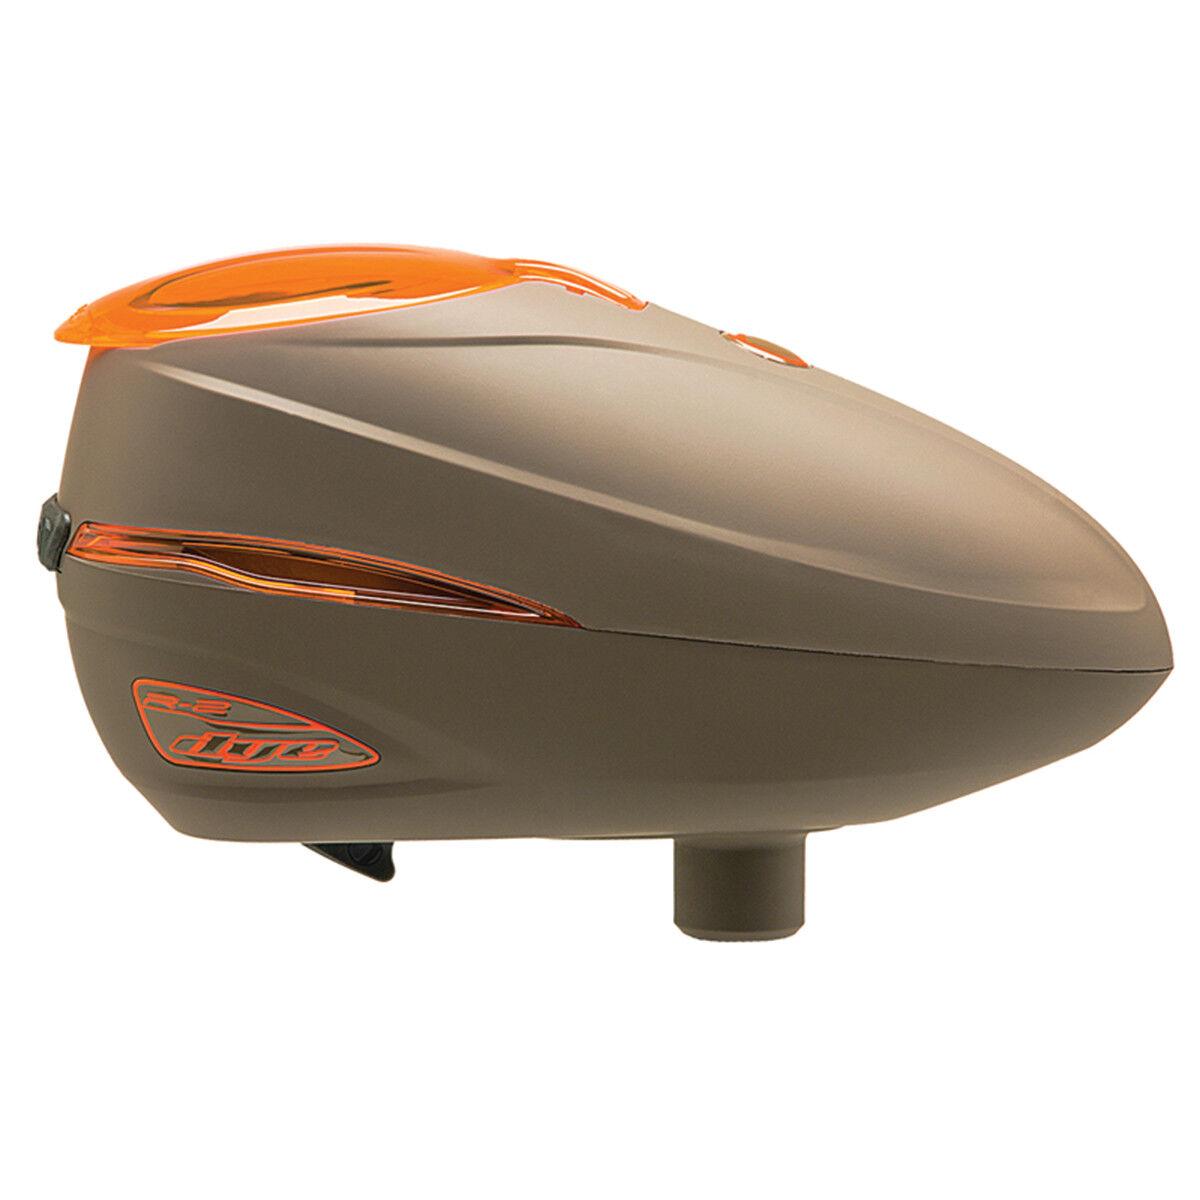 Farbstoff Rotor R2 Paintball Loader - Bucs